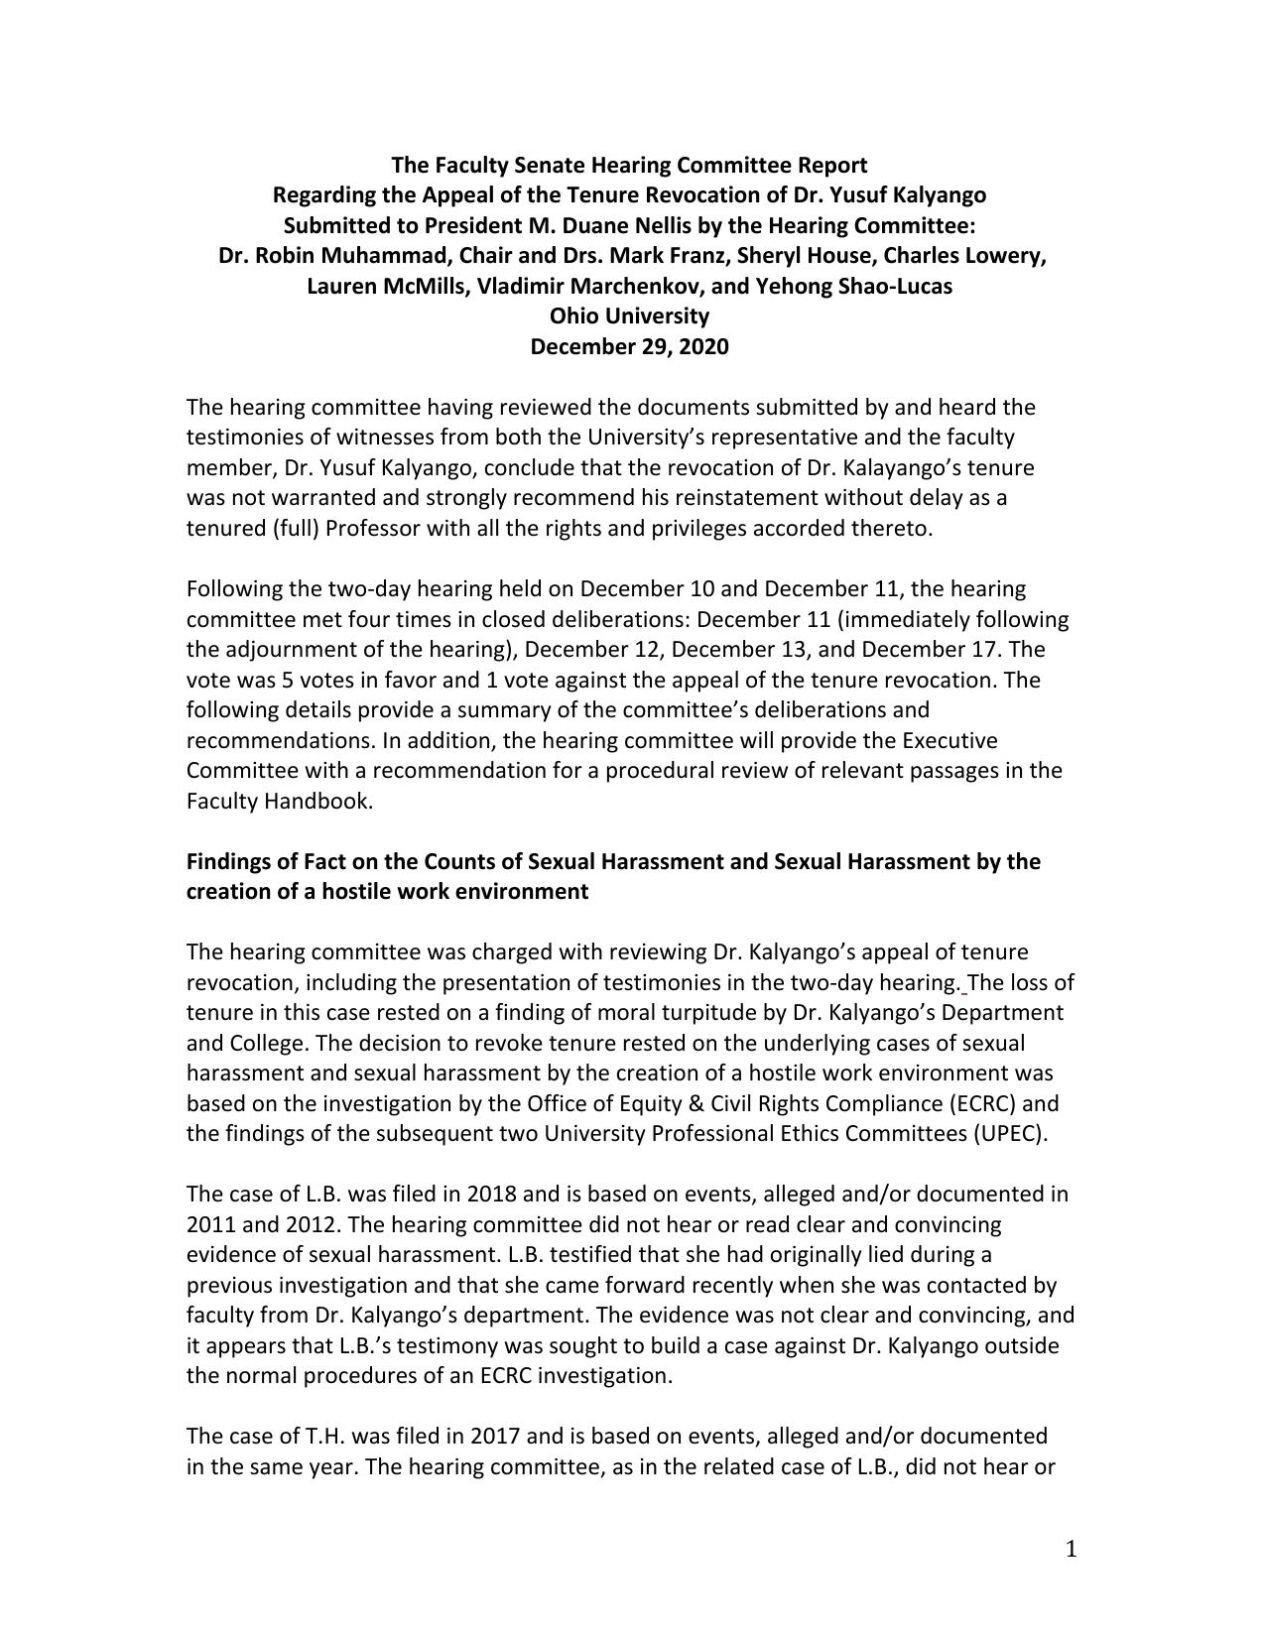 Faculty Senate Report Regarding Kalyango Tenure Revocation Appeal